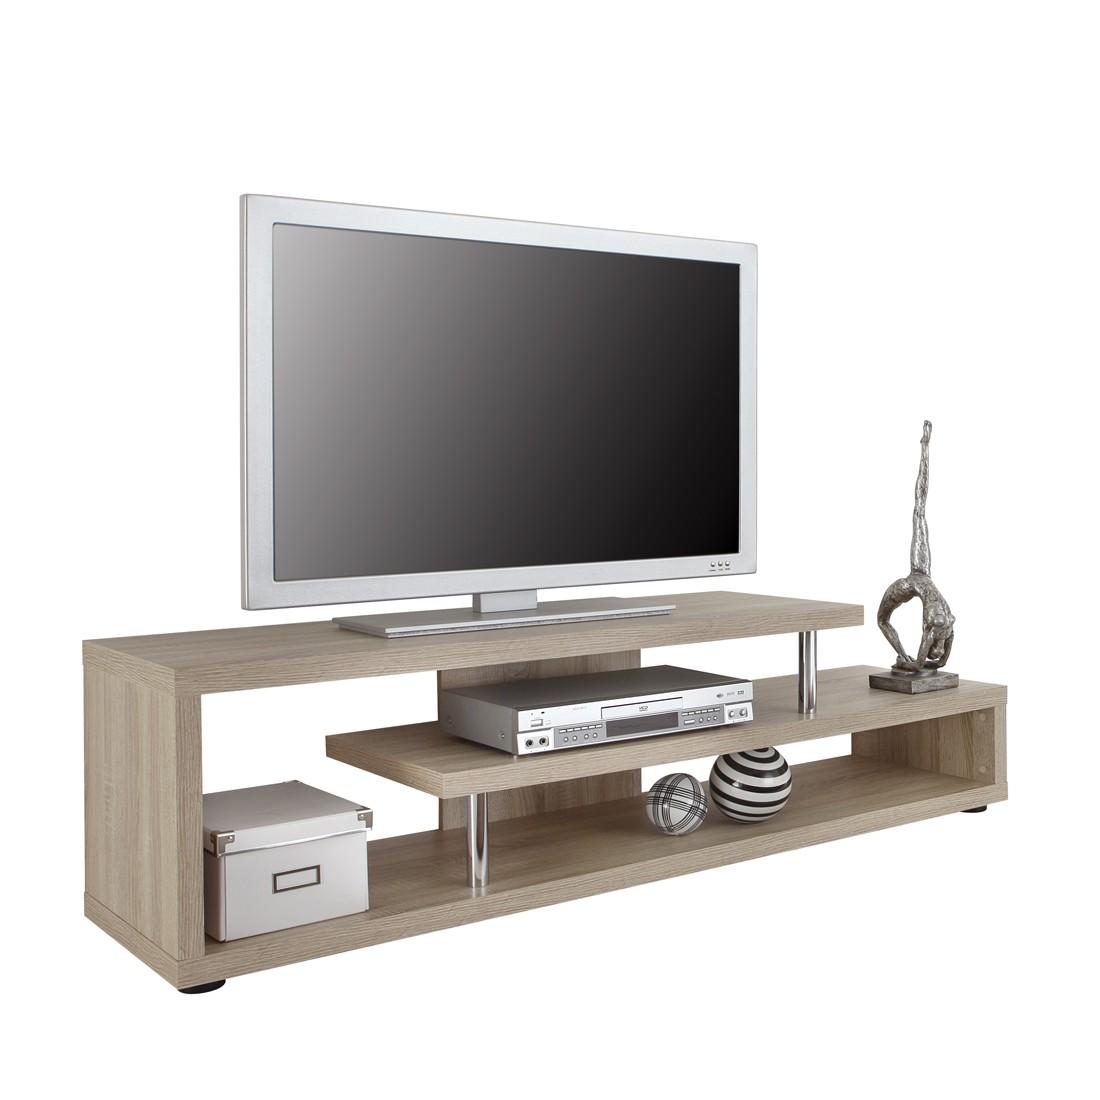 Meuble TV Wasco - Chêne de Sonoma, roomscape